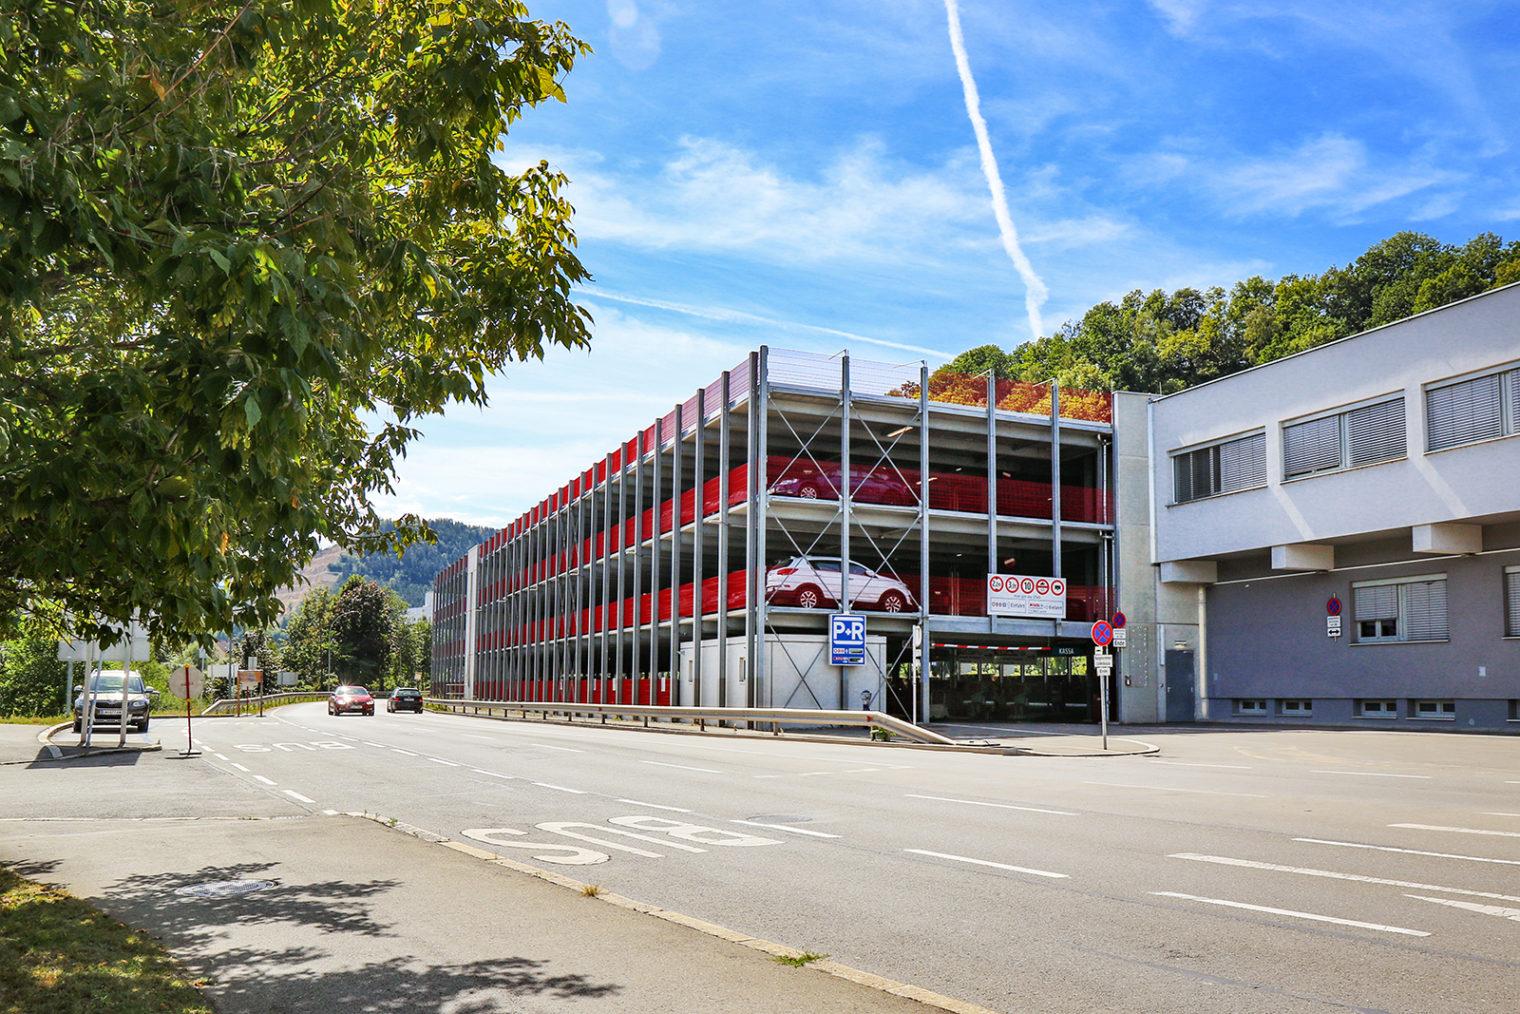 Park and Ride Parkplätze am Leobener Bahnhof